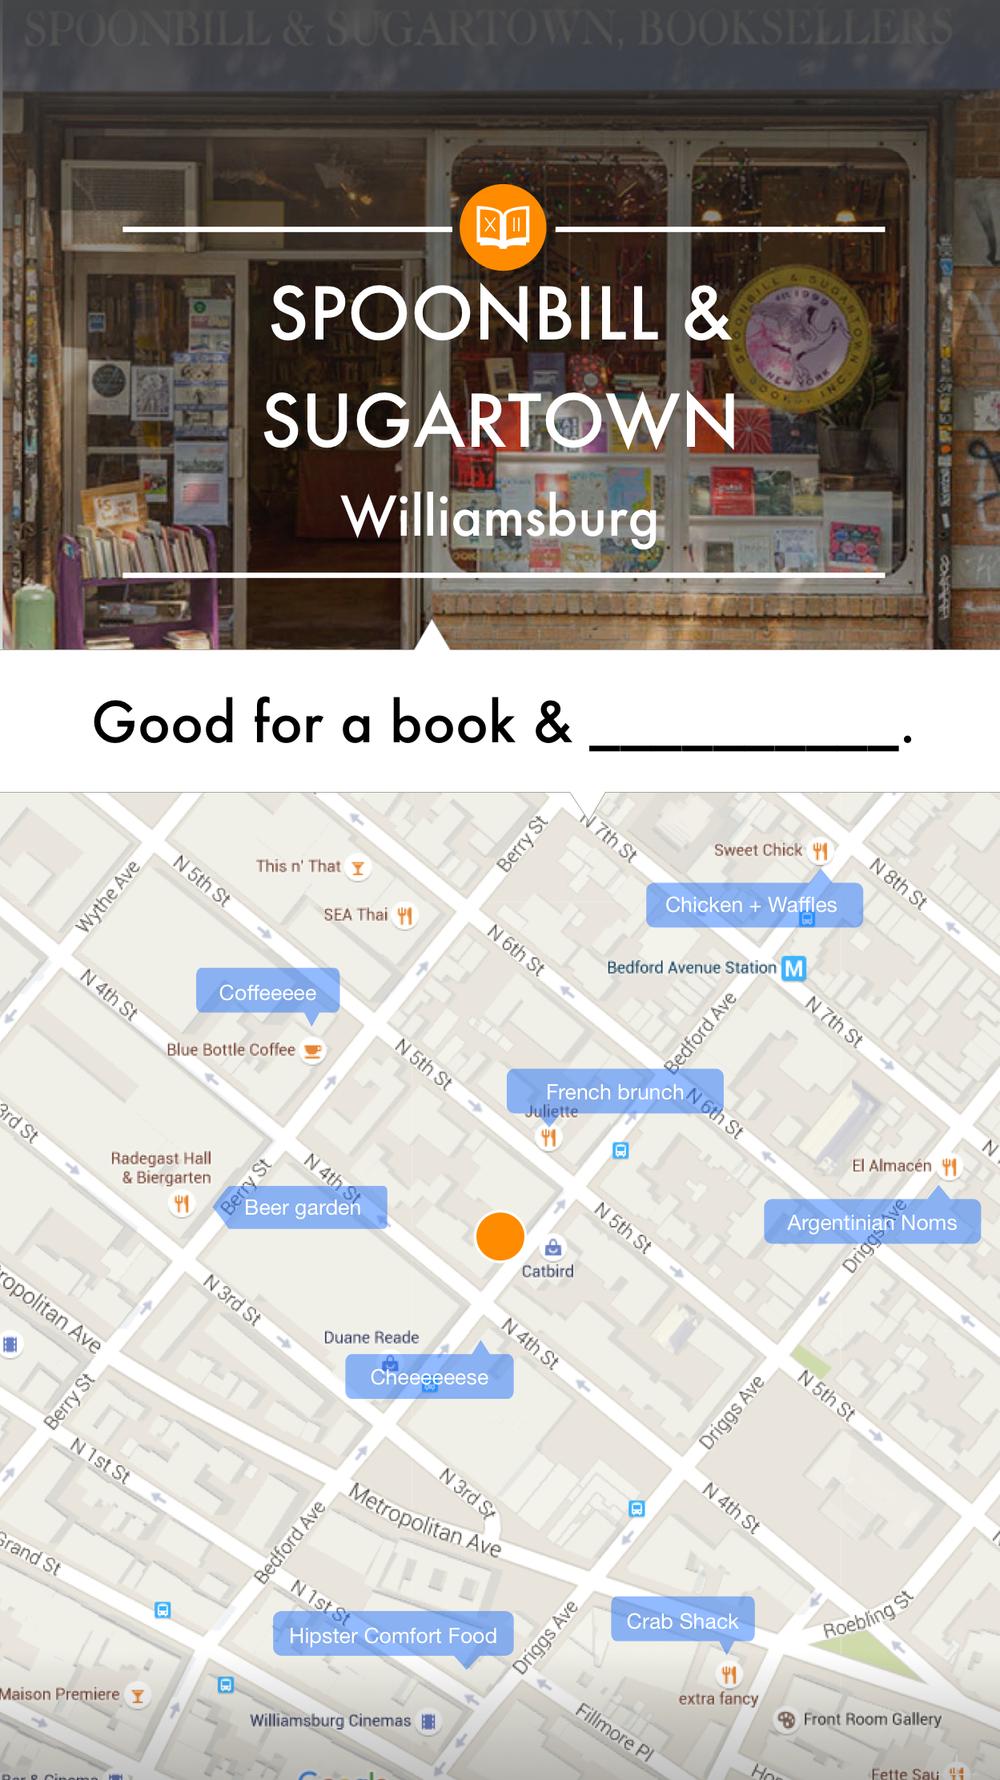 Spoonbill & Sugartown.jpg